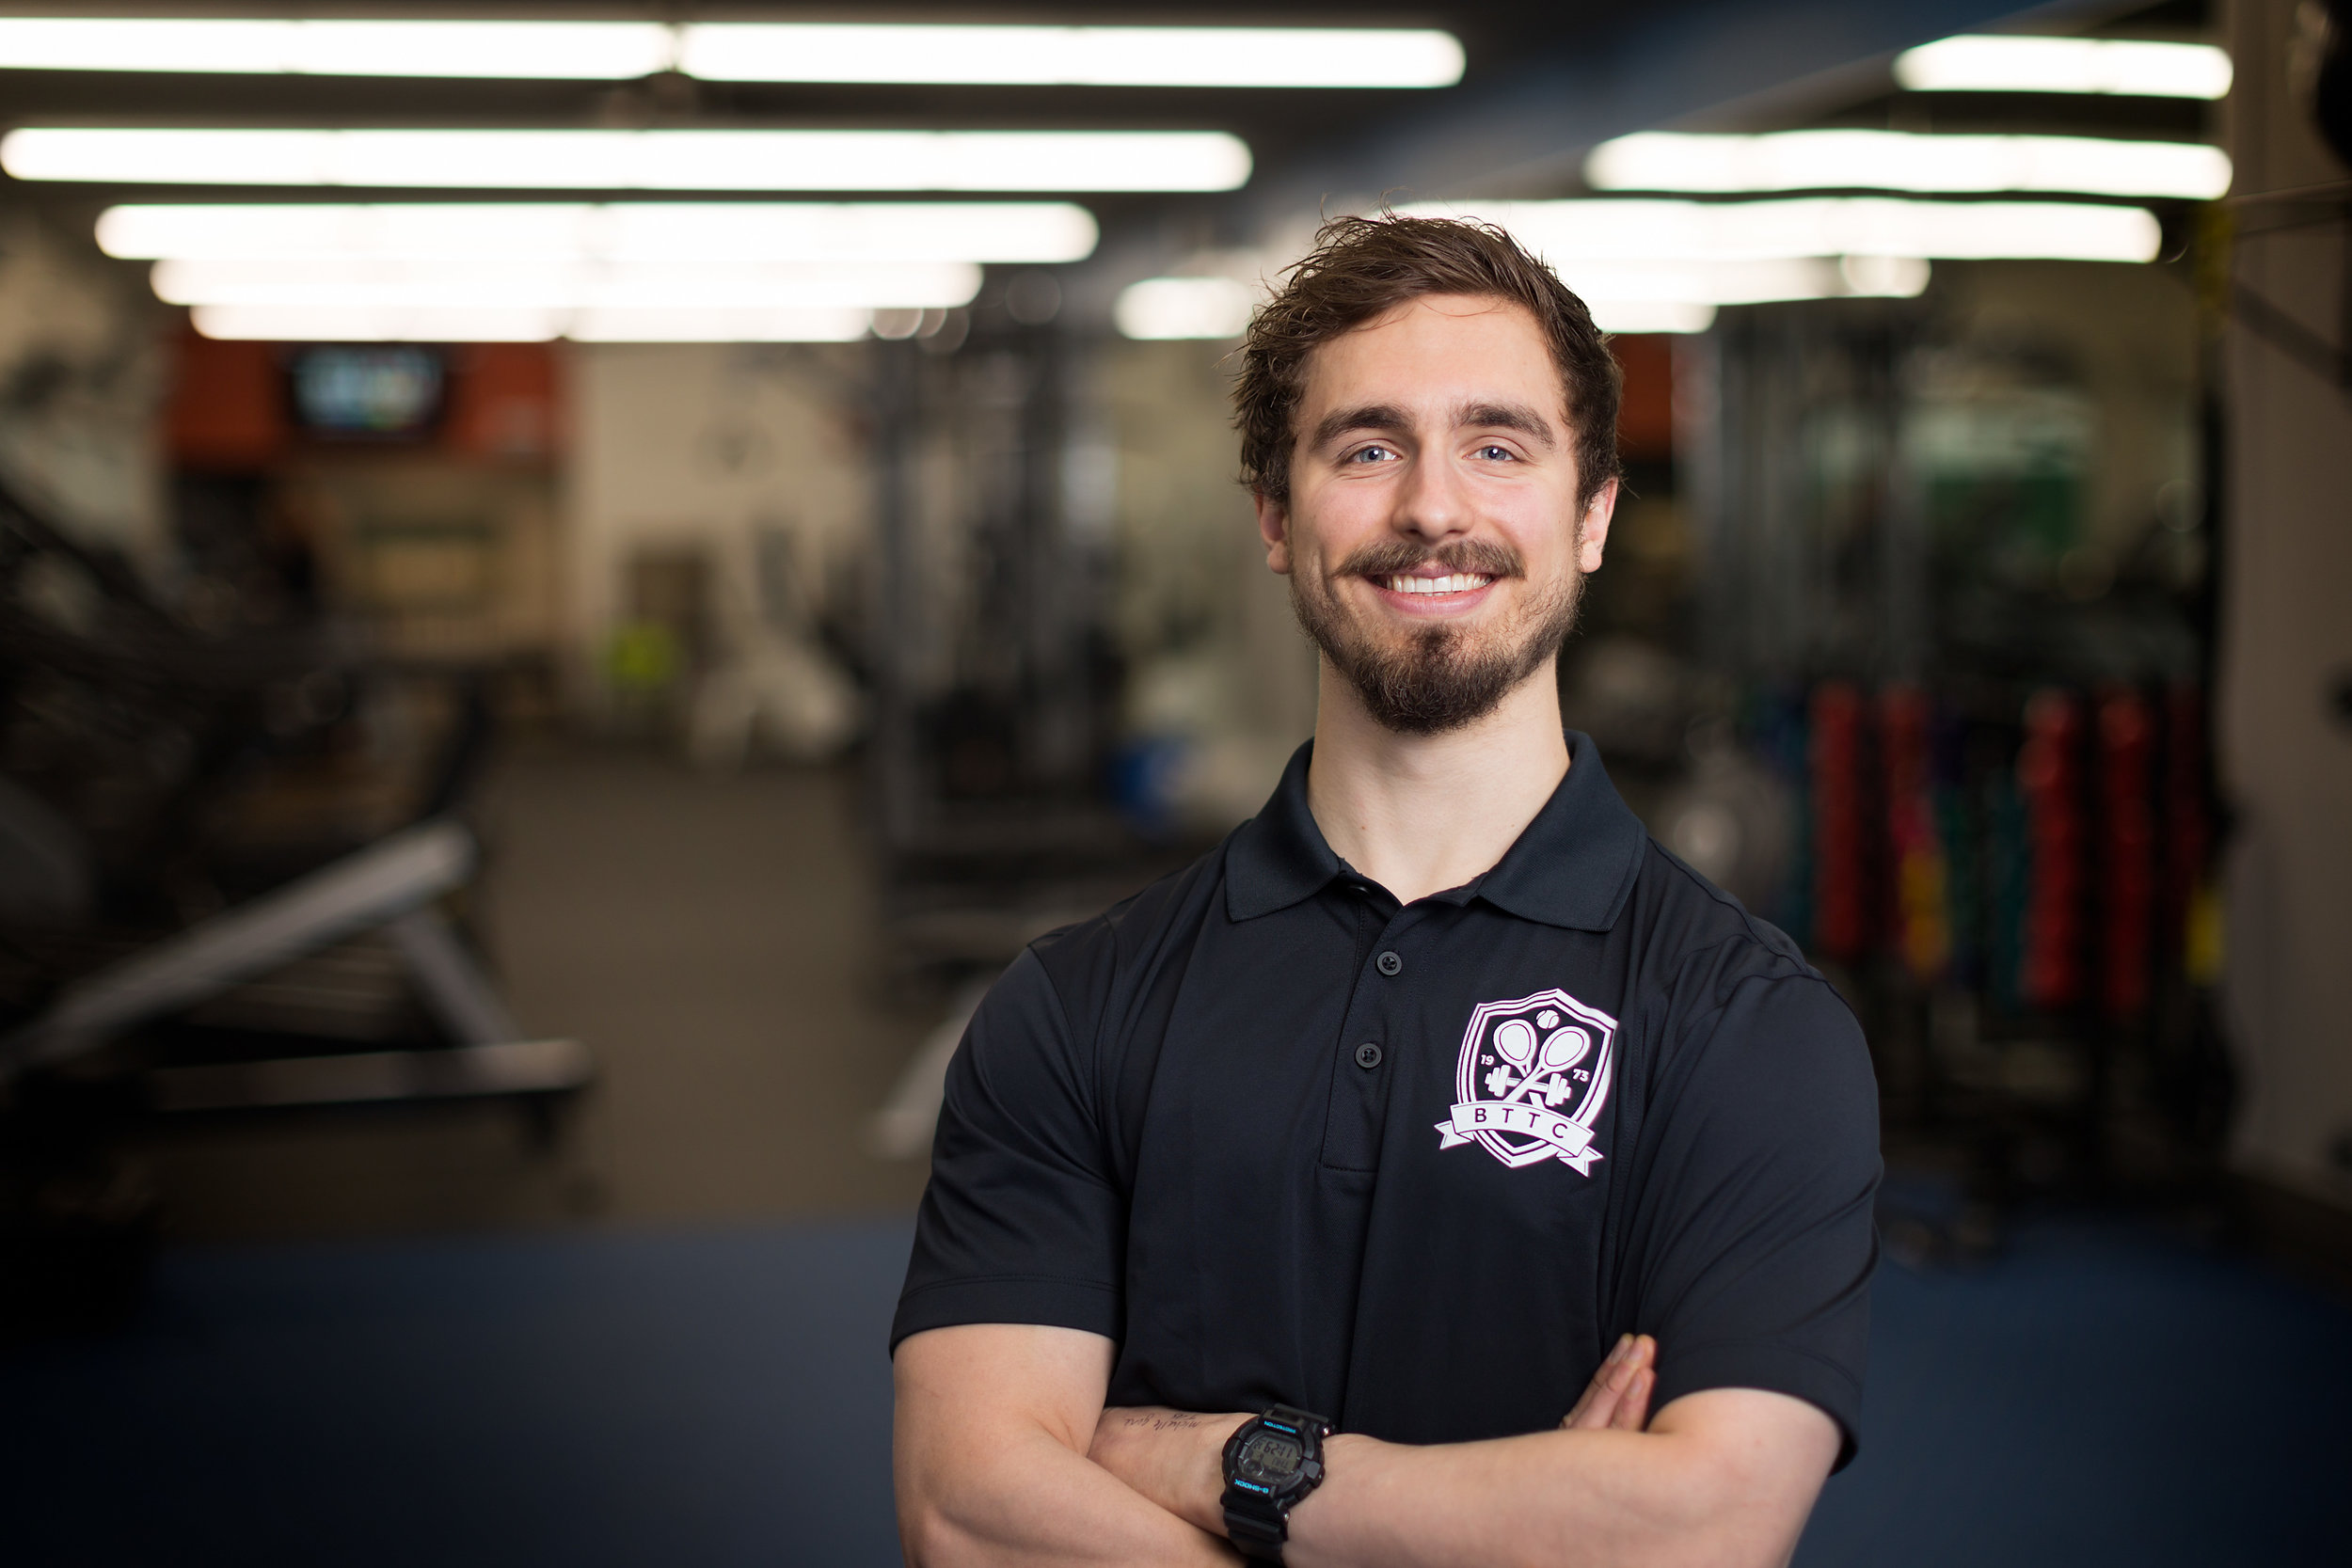 Tyler Brown Headshot Functional Training Area.jpg